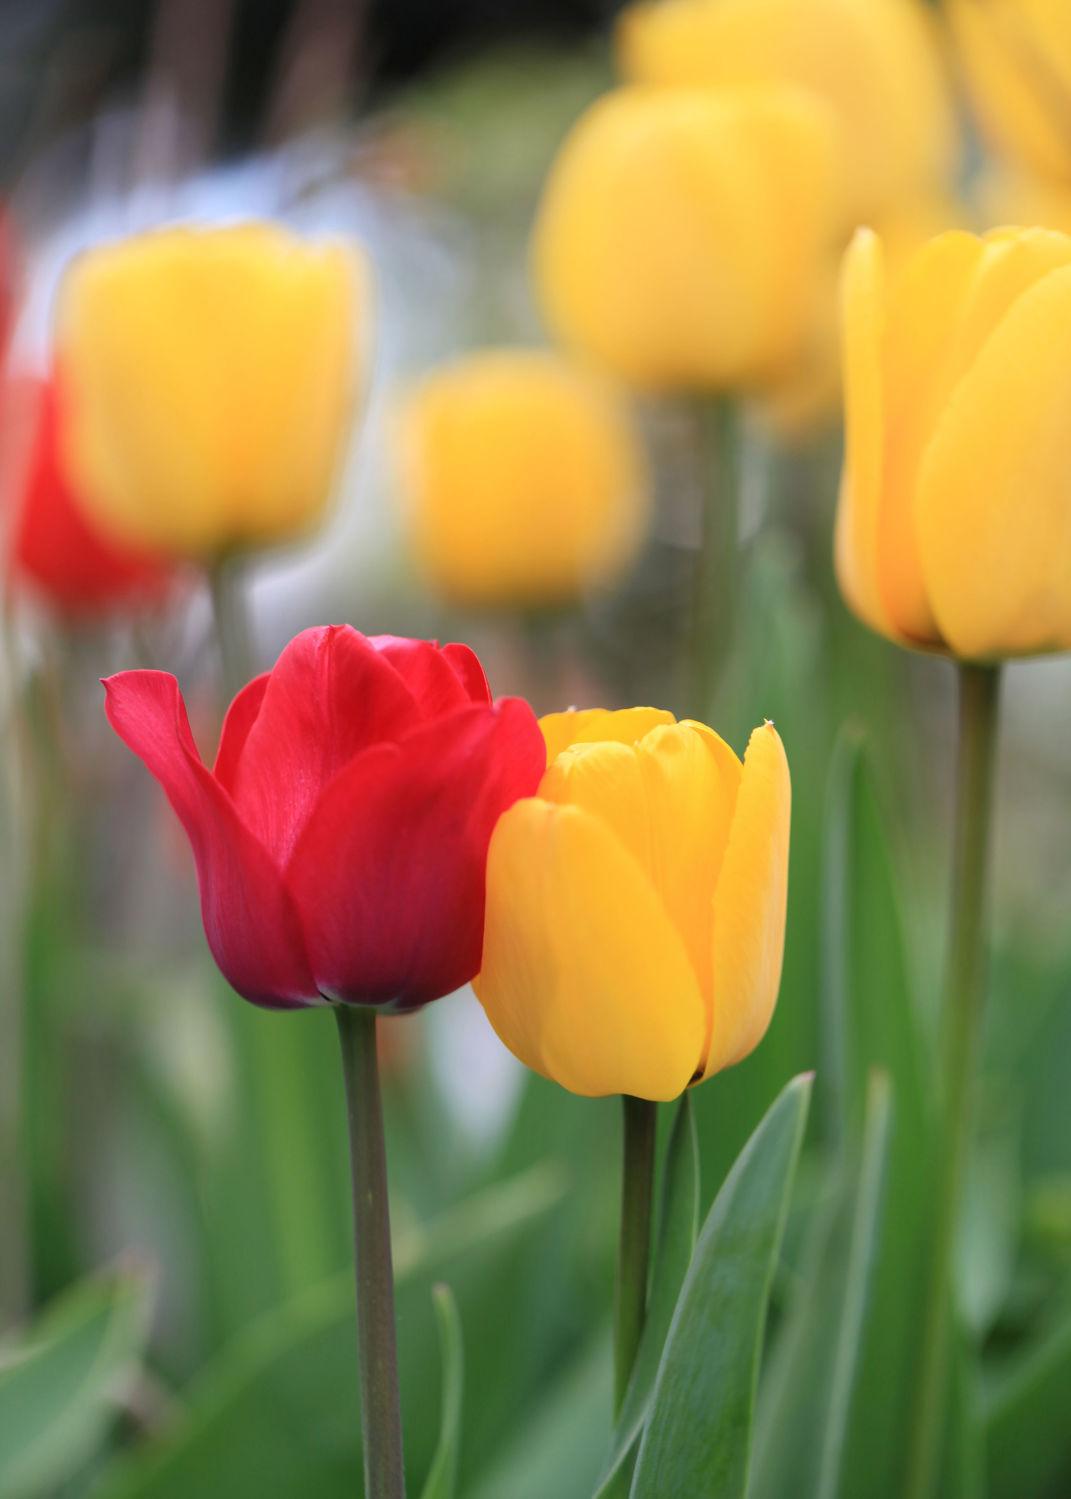 Bild mit Pflanzen, Blumen, Blumen, Tulpe, Tulpen, Blüten, blüte